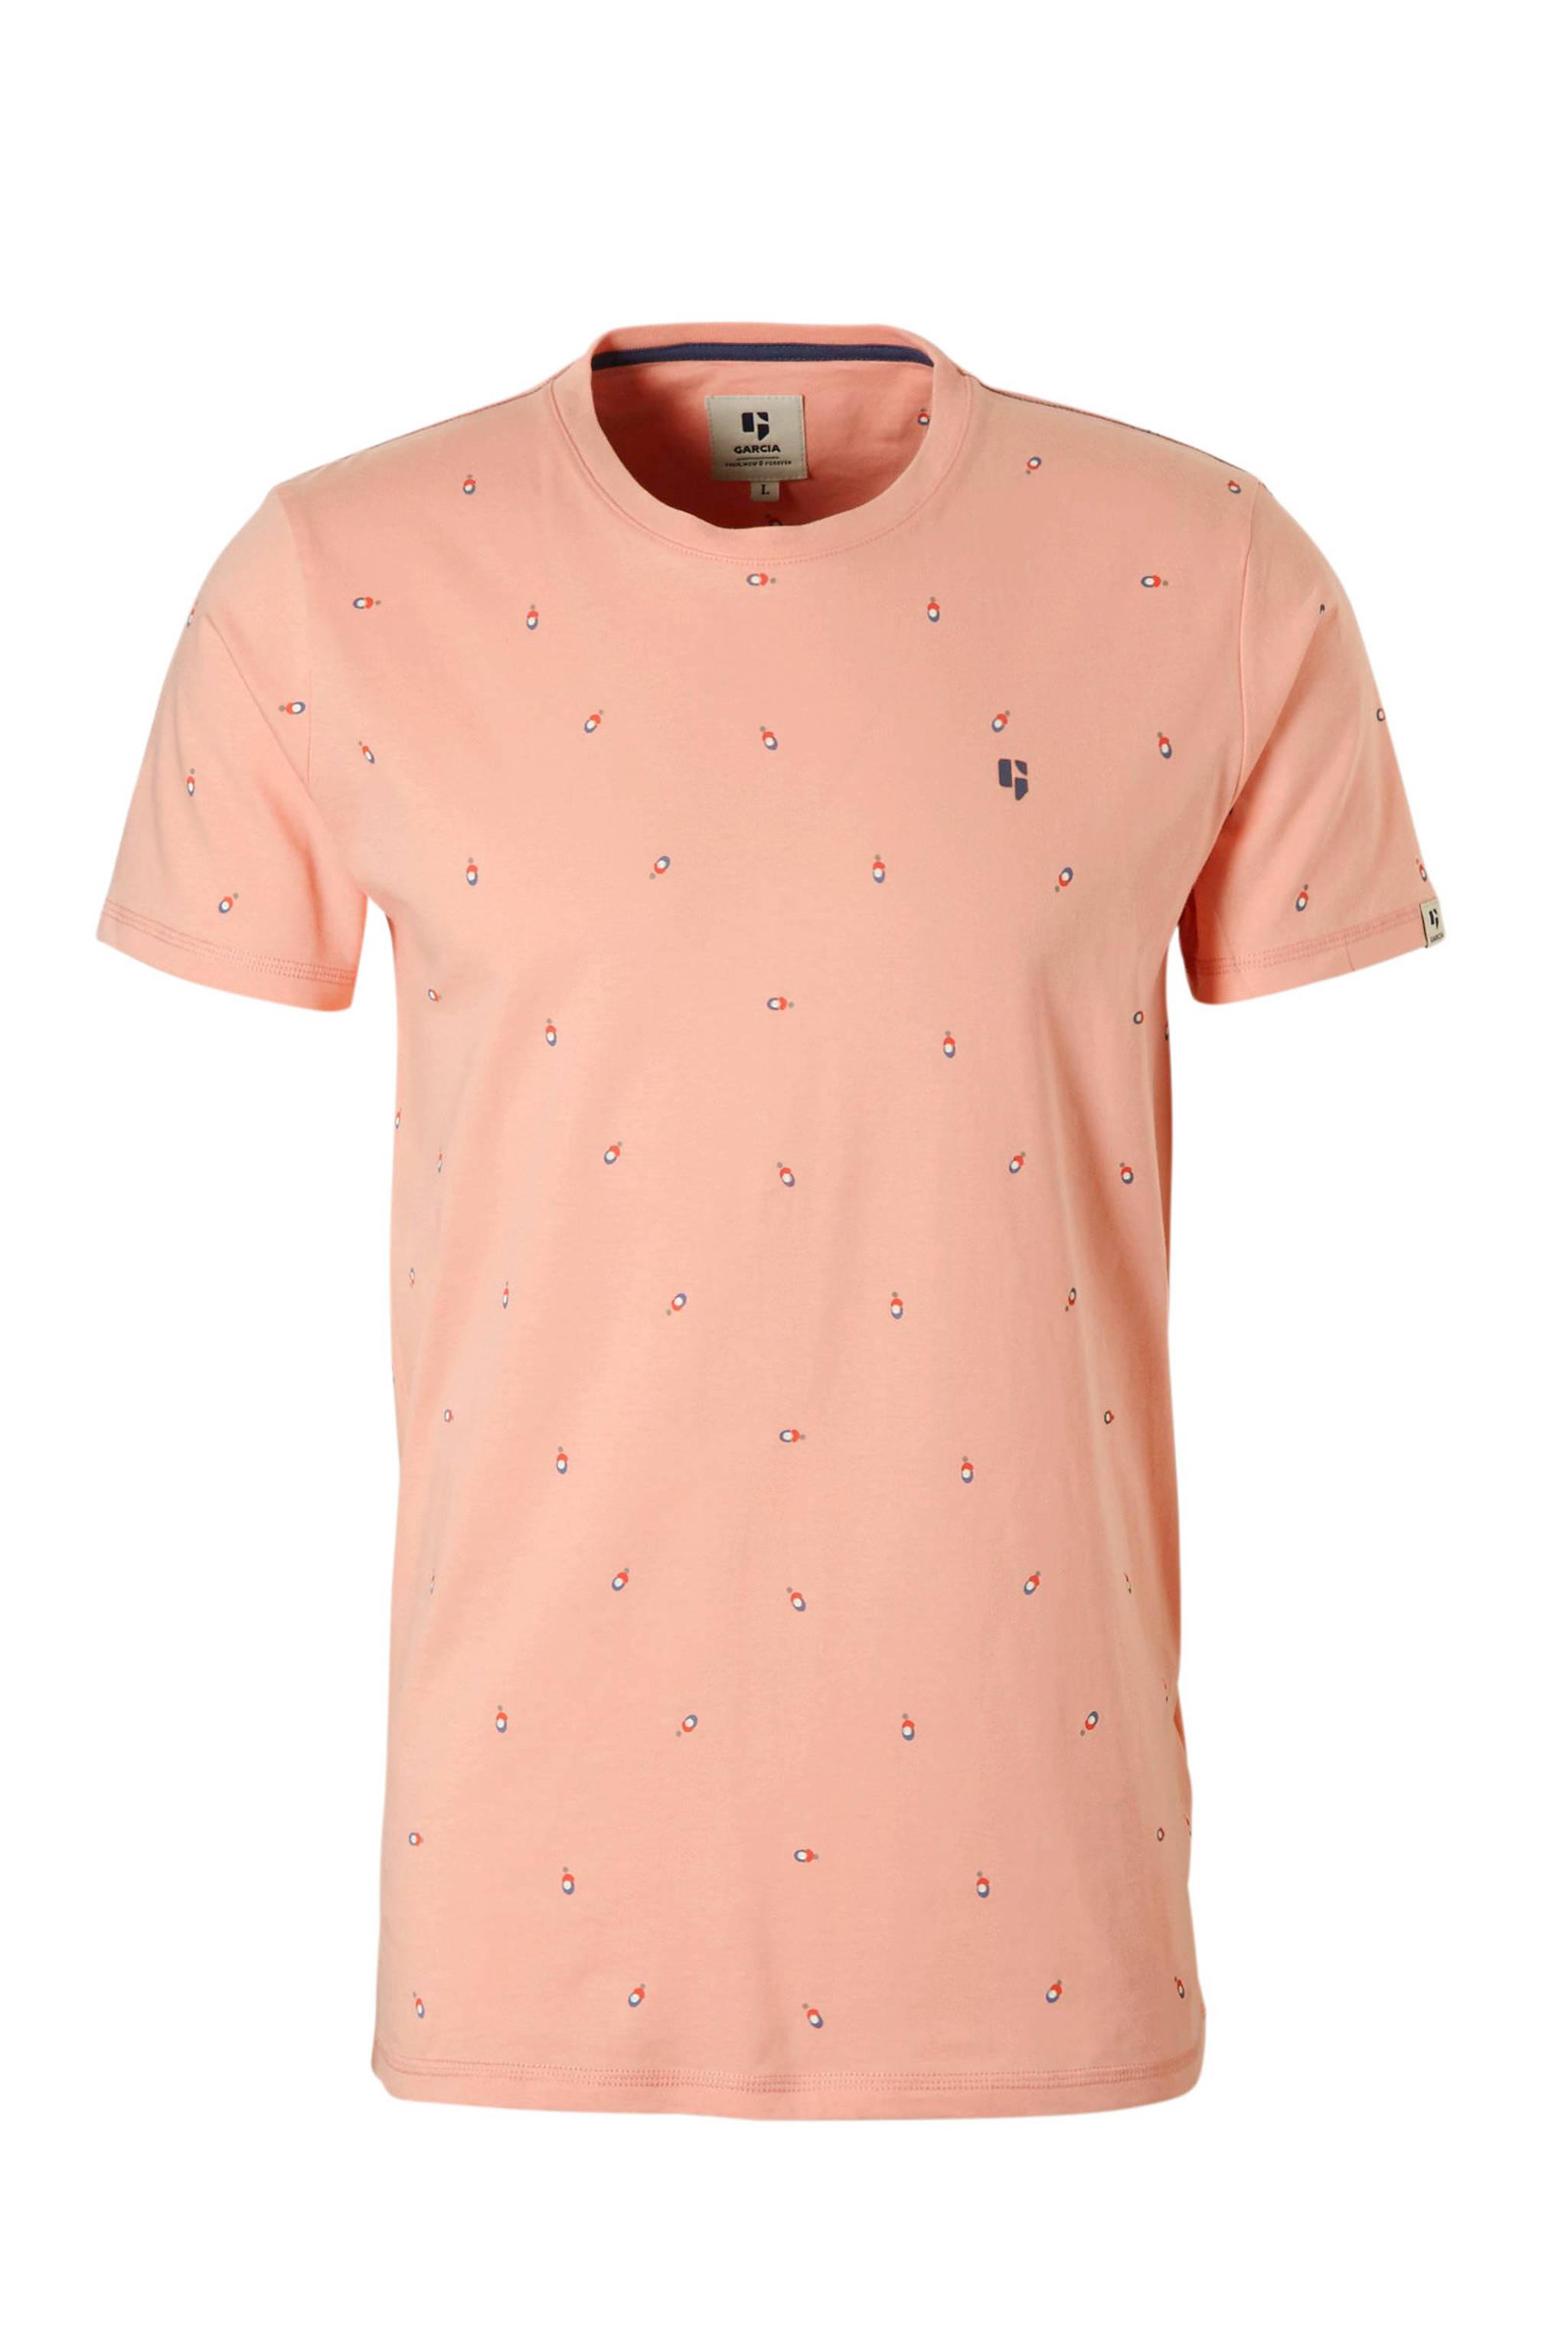 8dd063e20cc9fb Garcia T-shirt   wehkamp